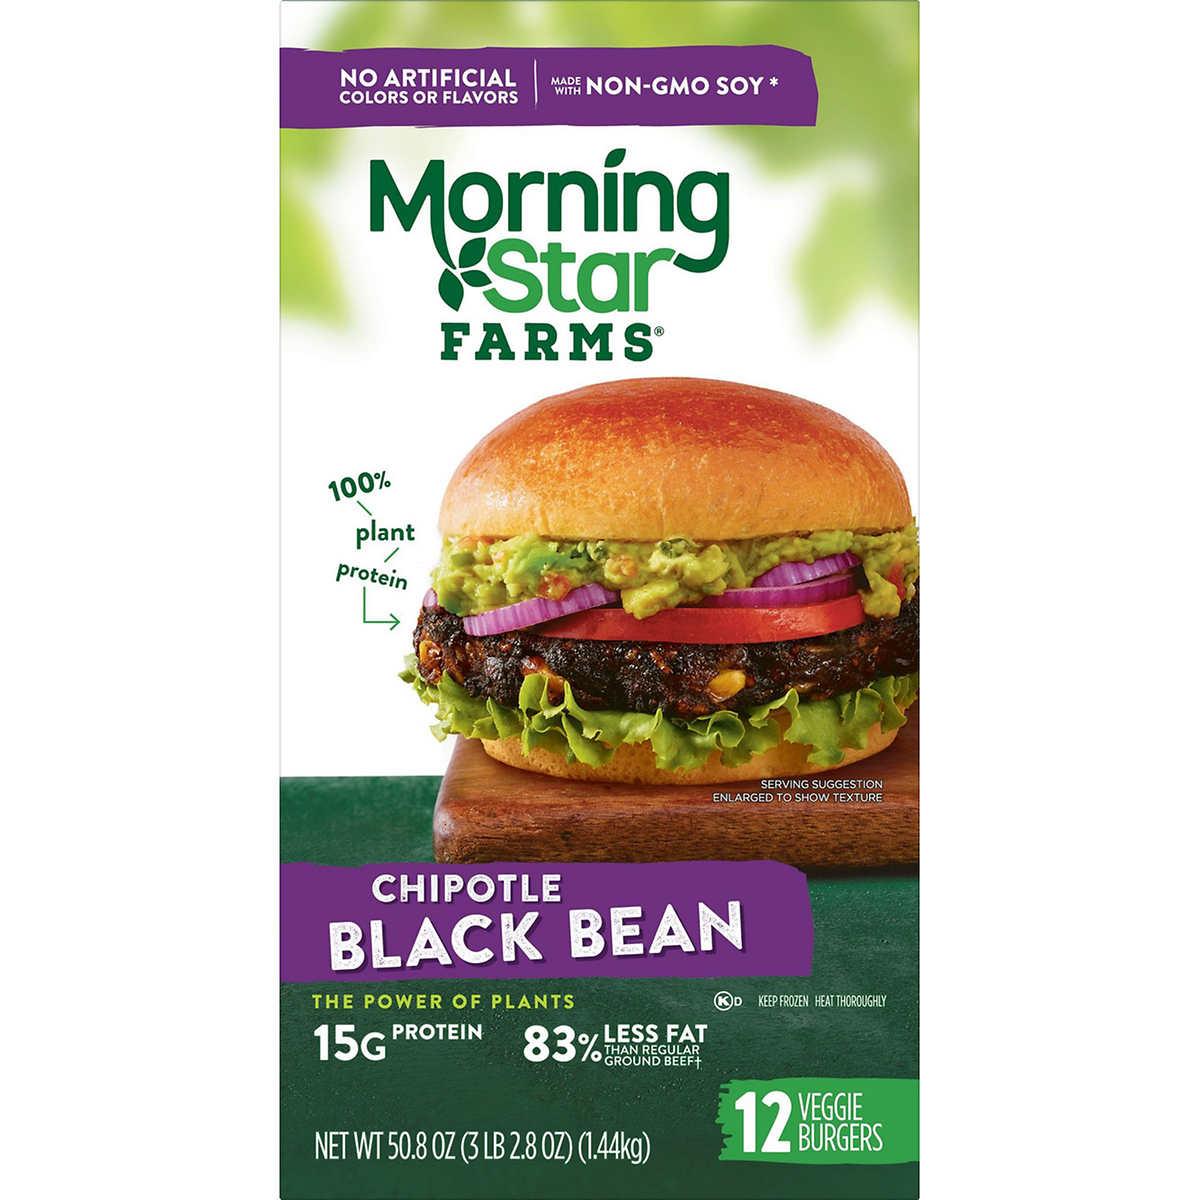 Morningstar Farms Chipotle Black Bean Burger 4 2 Oz 12 Ct